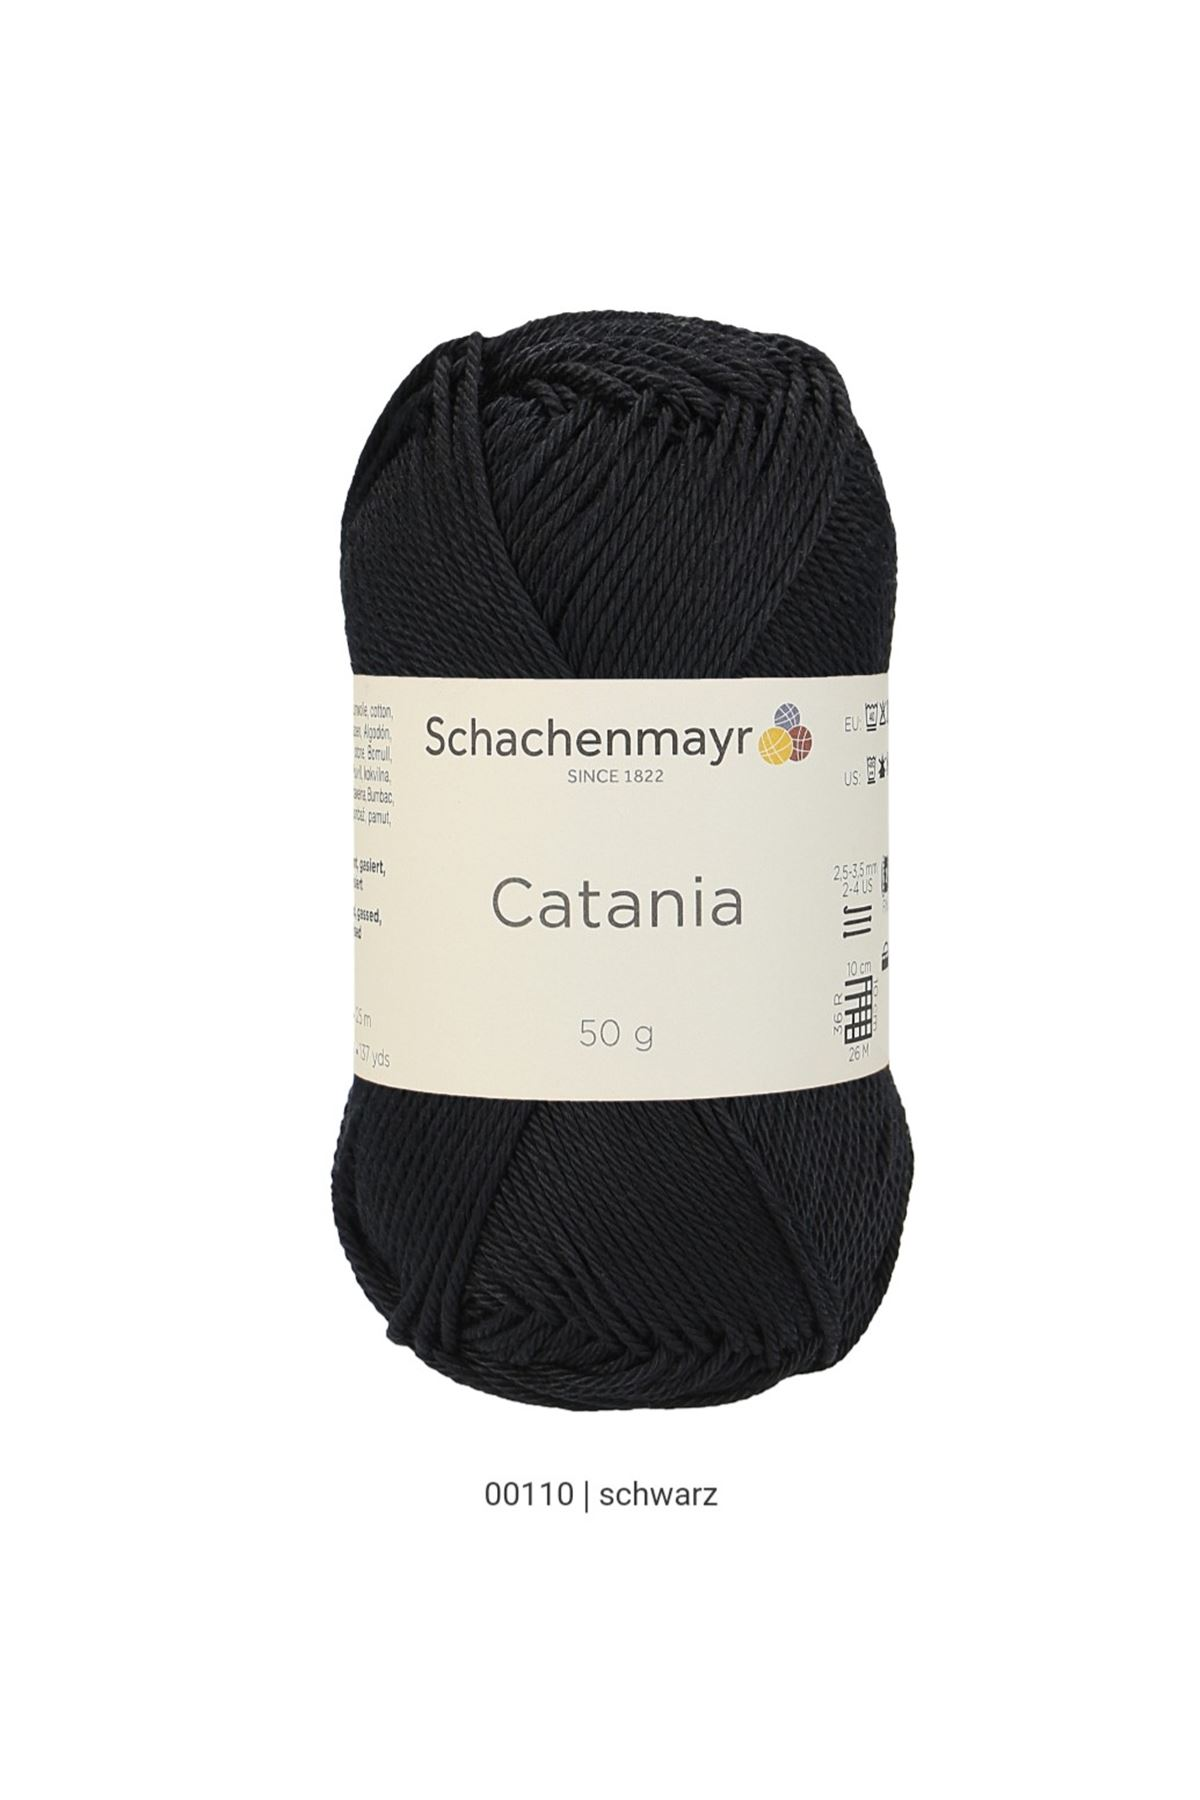 SMC Catania 50g 00110 Schwarz Siyah